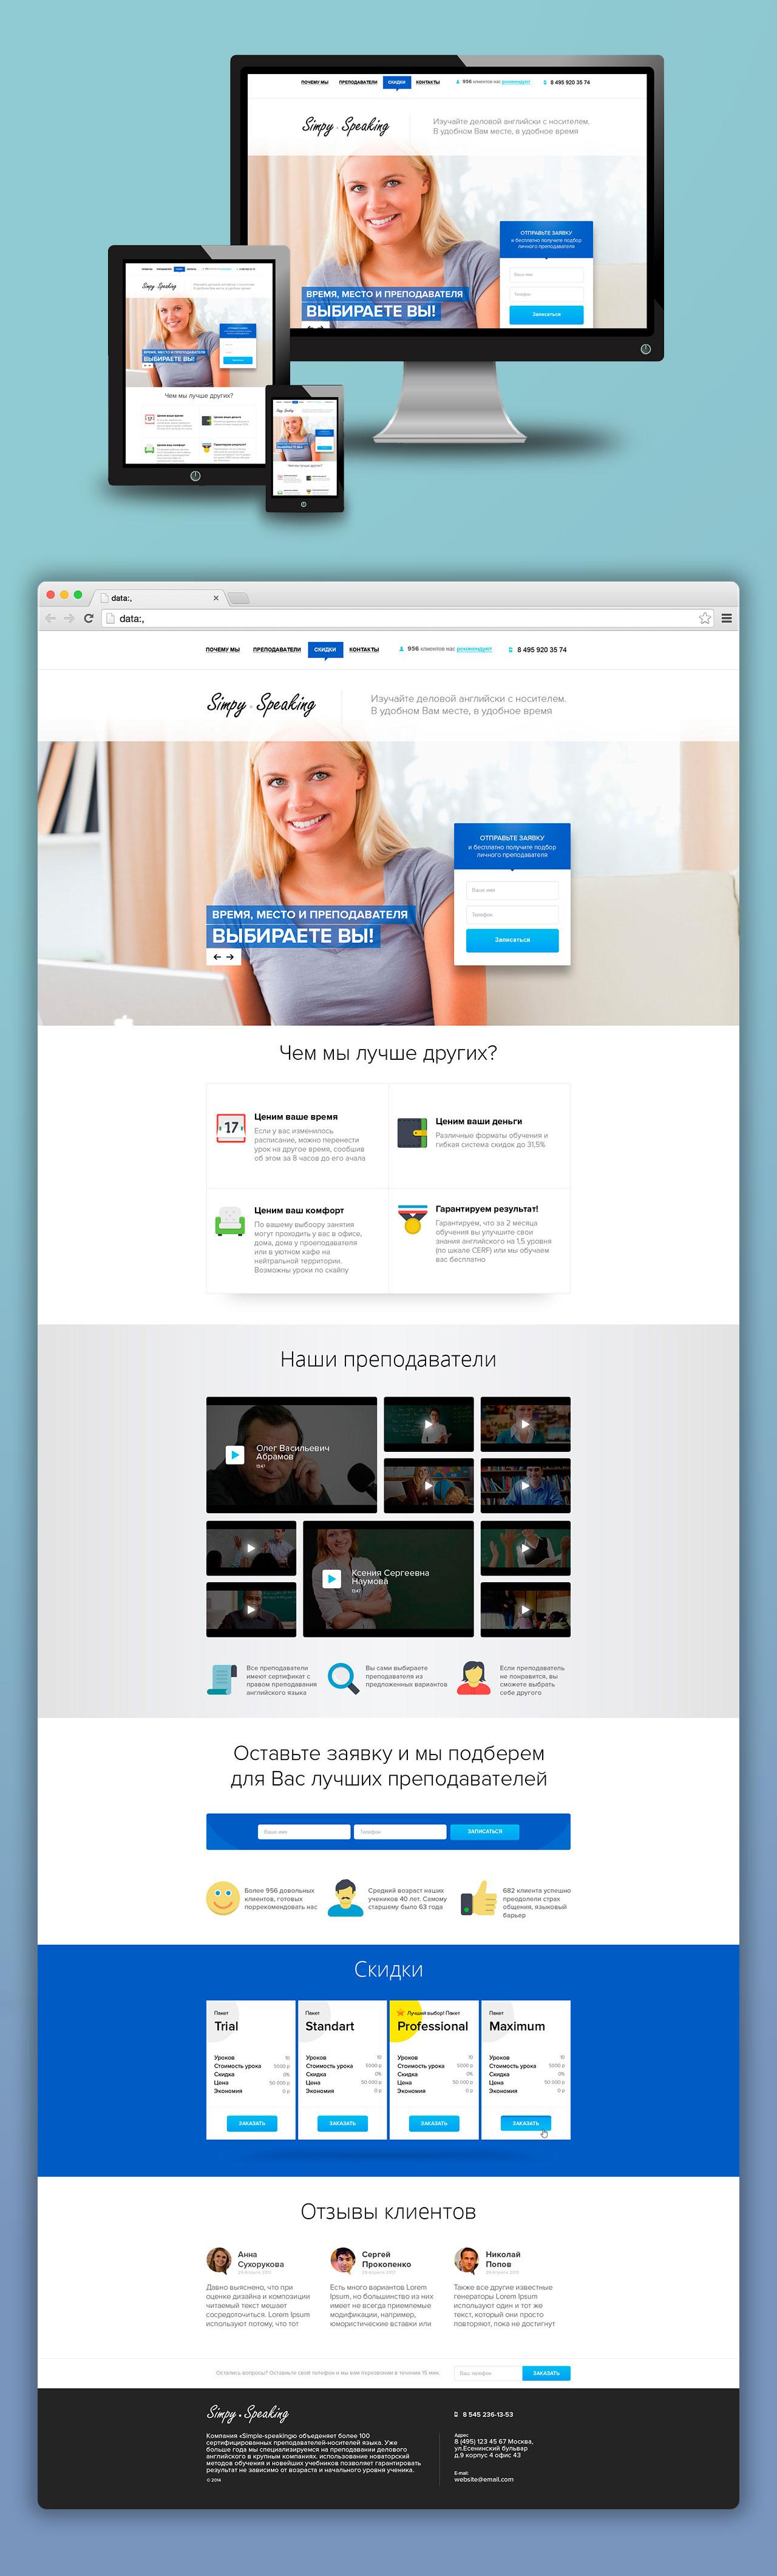 Дизайн Landing Page для школы английского языка Simple Speaking